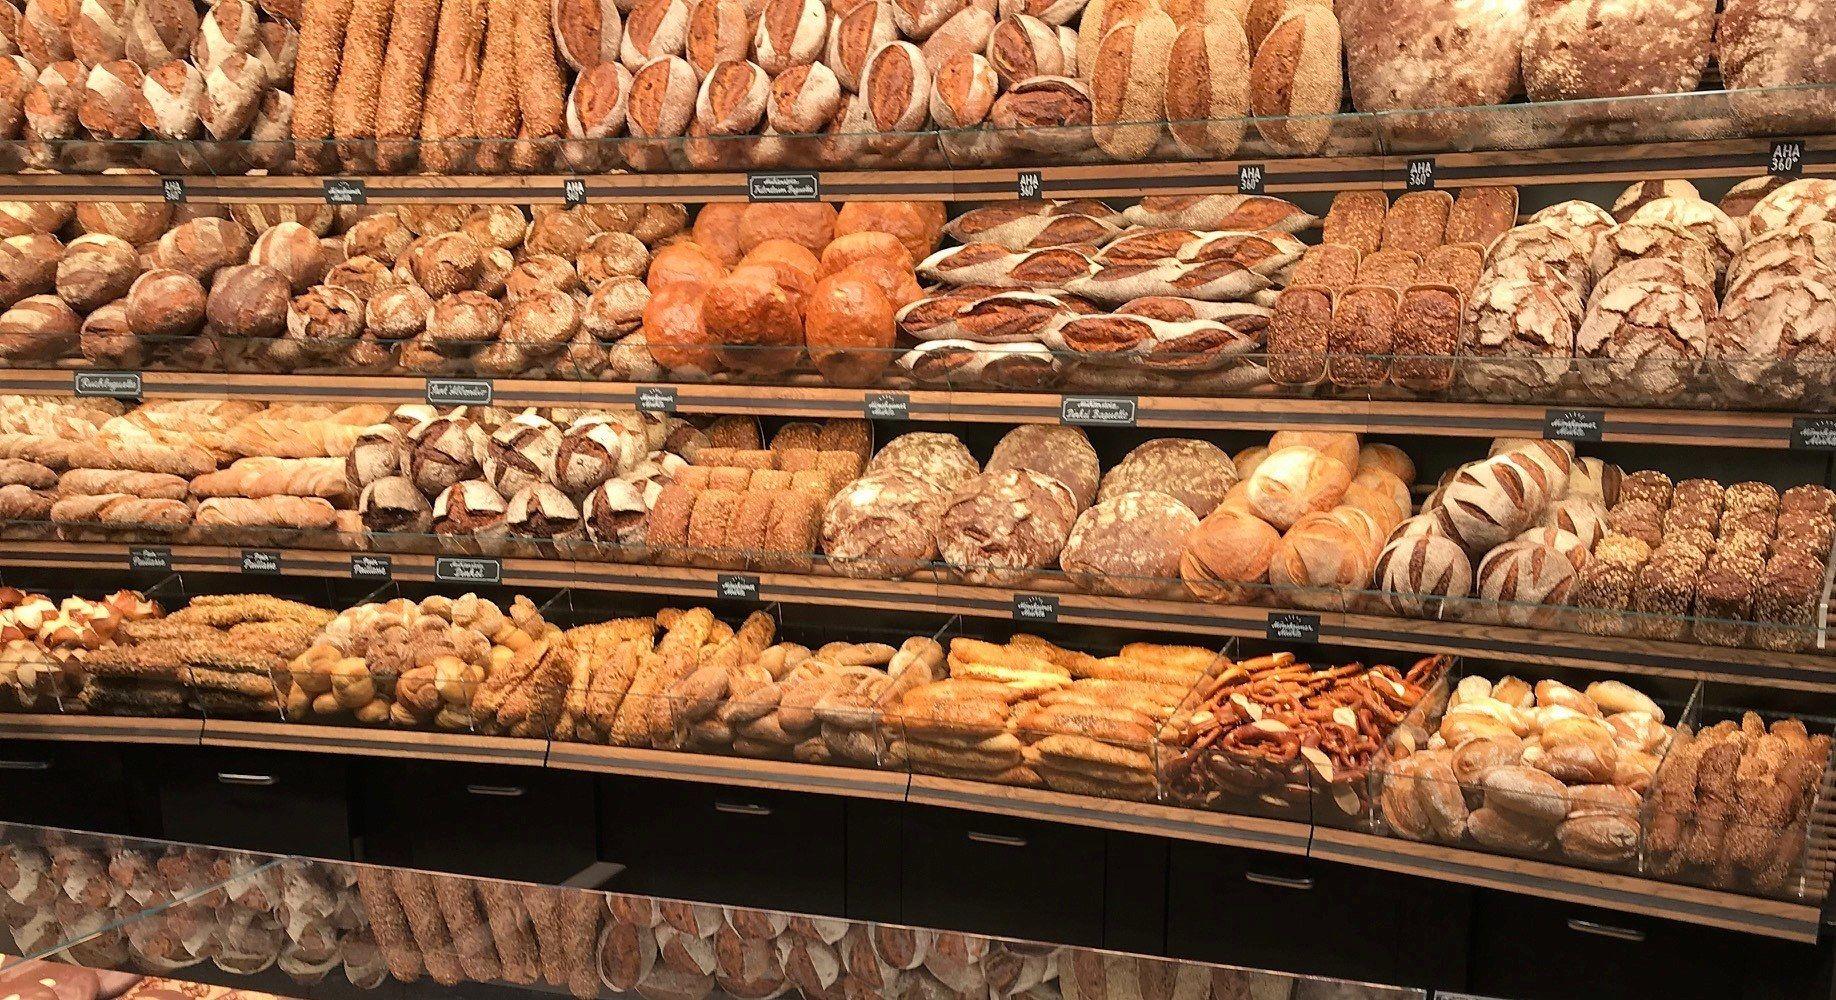 Aktuelle Neuigkeiten | Bäckerei Jacobs Norderney